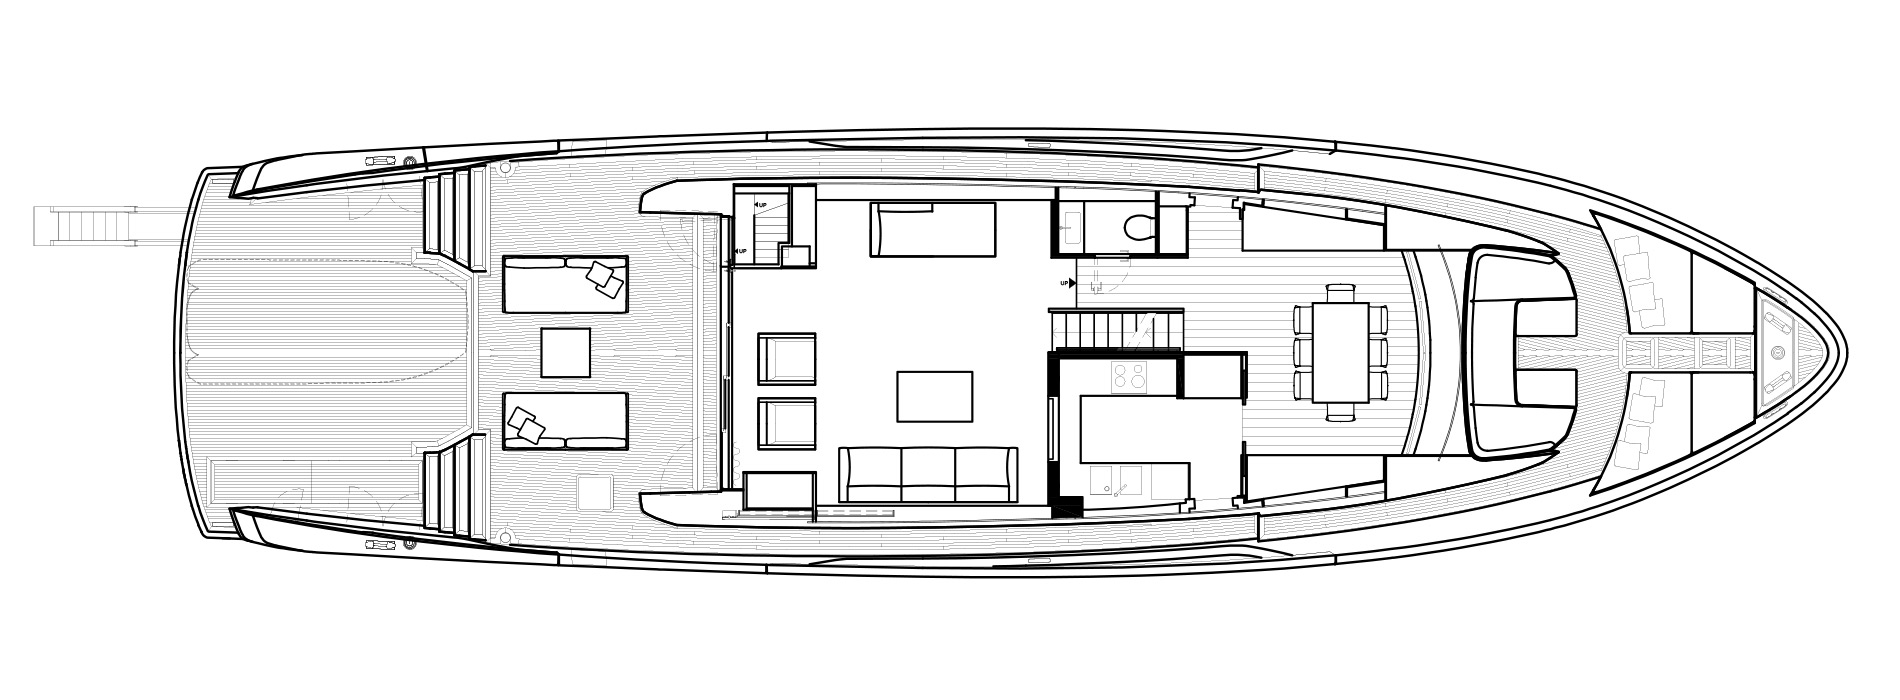 Sanlorenzo Yachts SX88 Главная палуба версия A Closed Galley